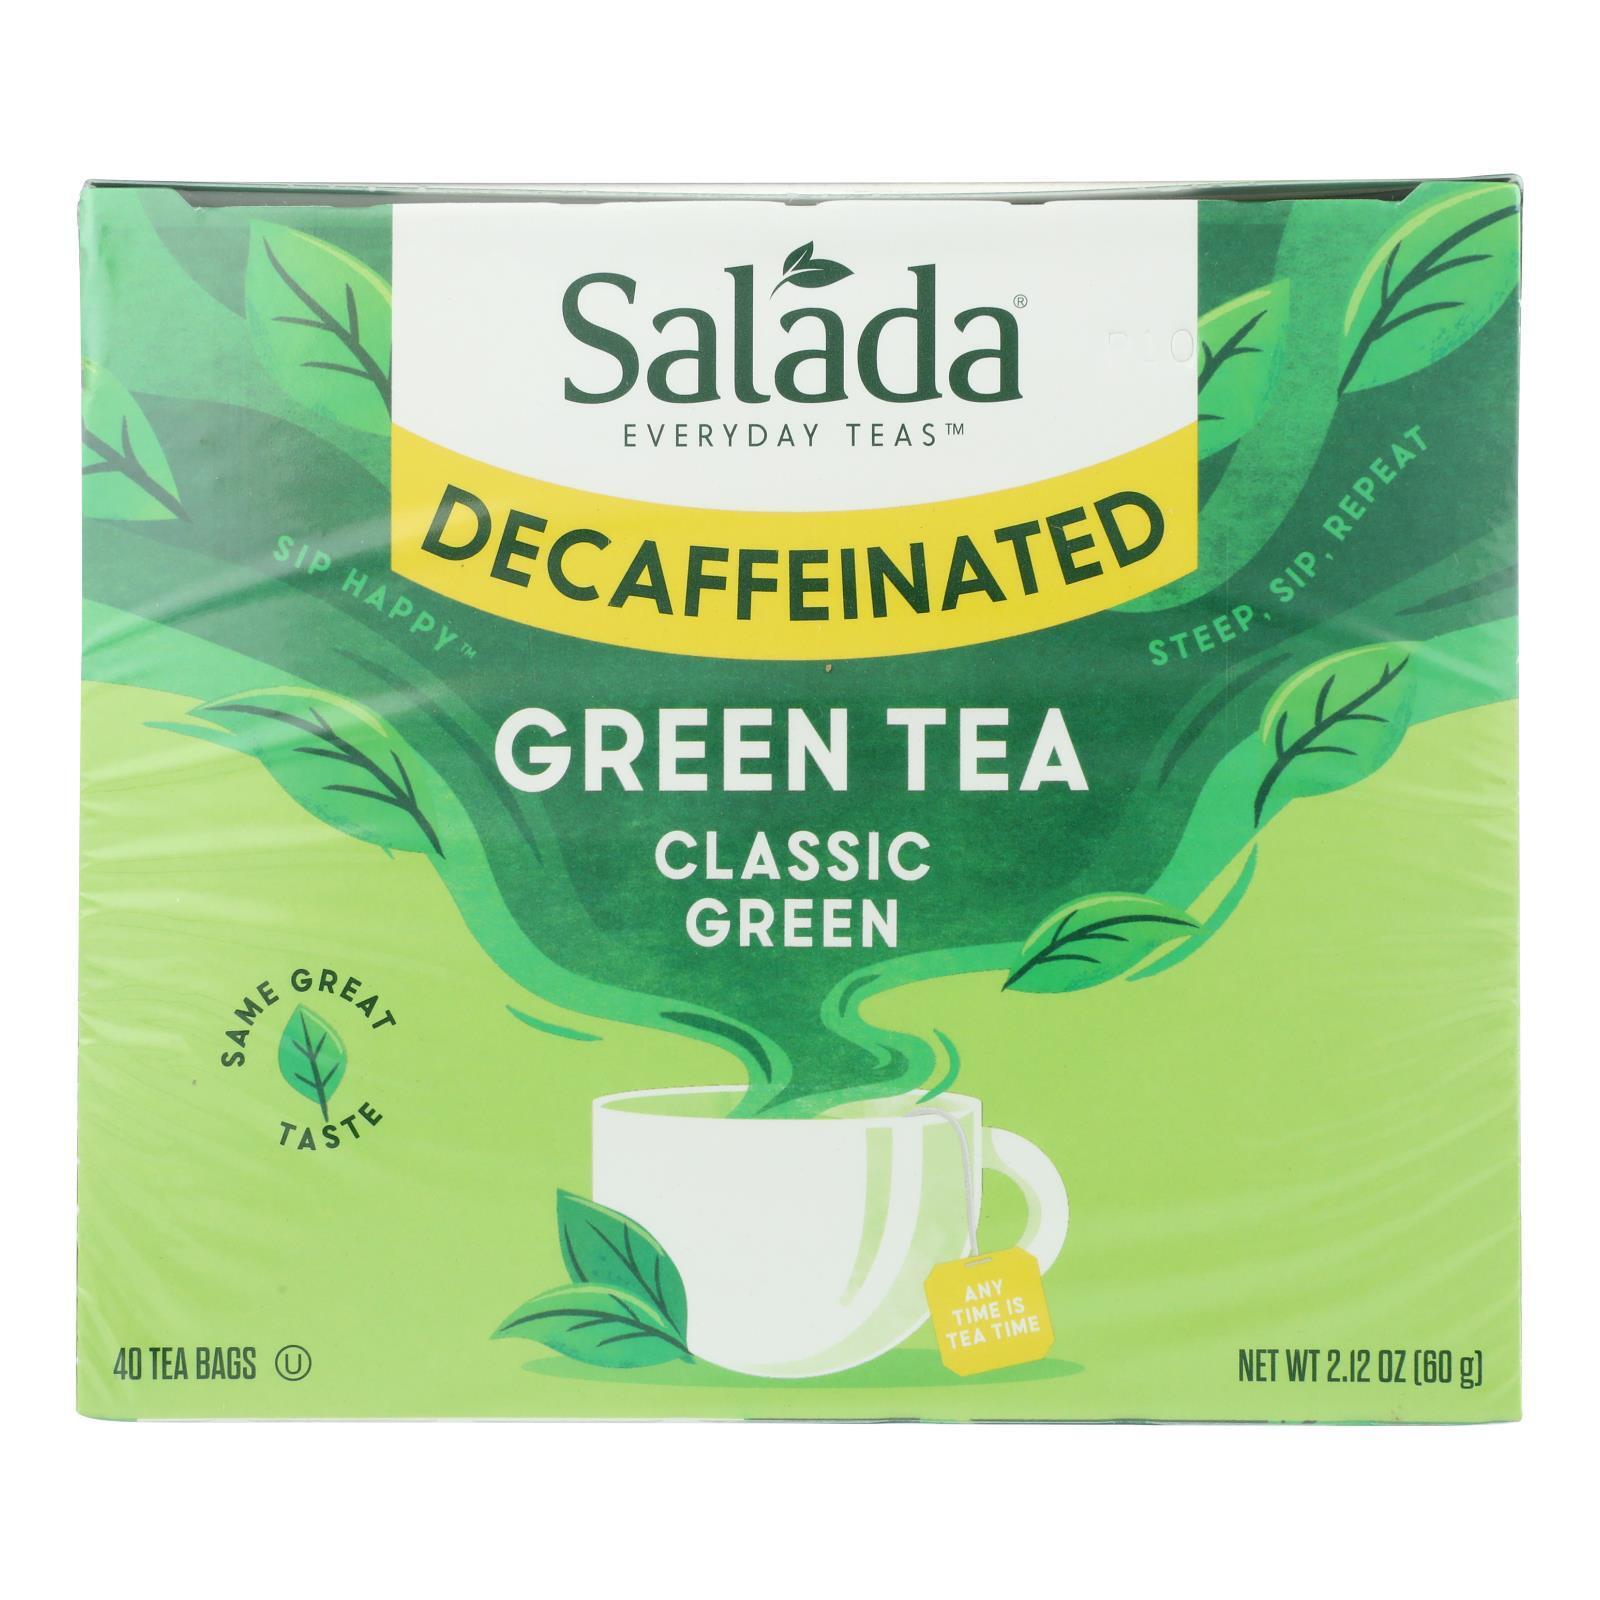 Salada Tea Green Tea - Decaffeinated Serenity - Case of 6 - 40 Count